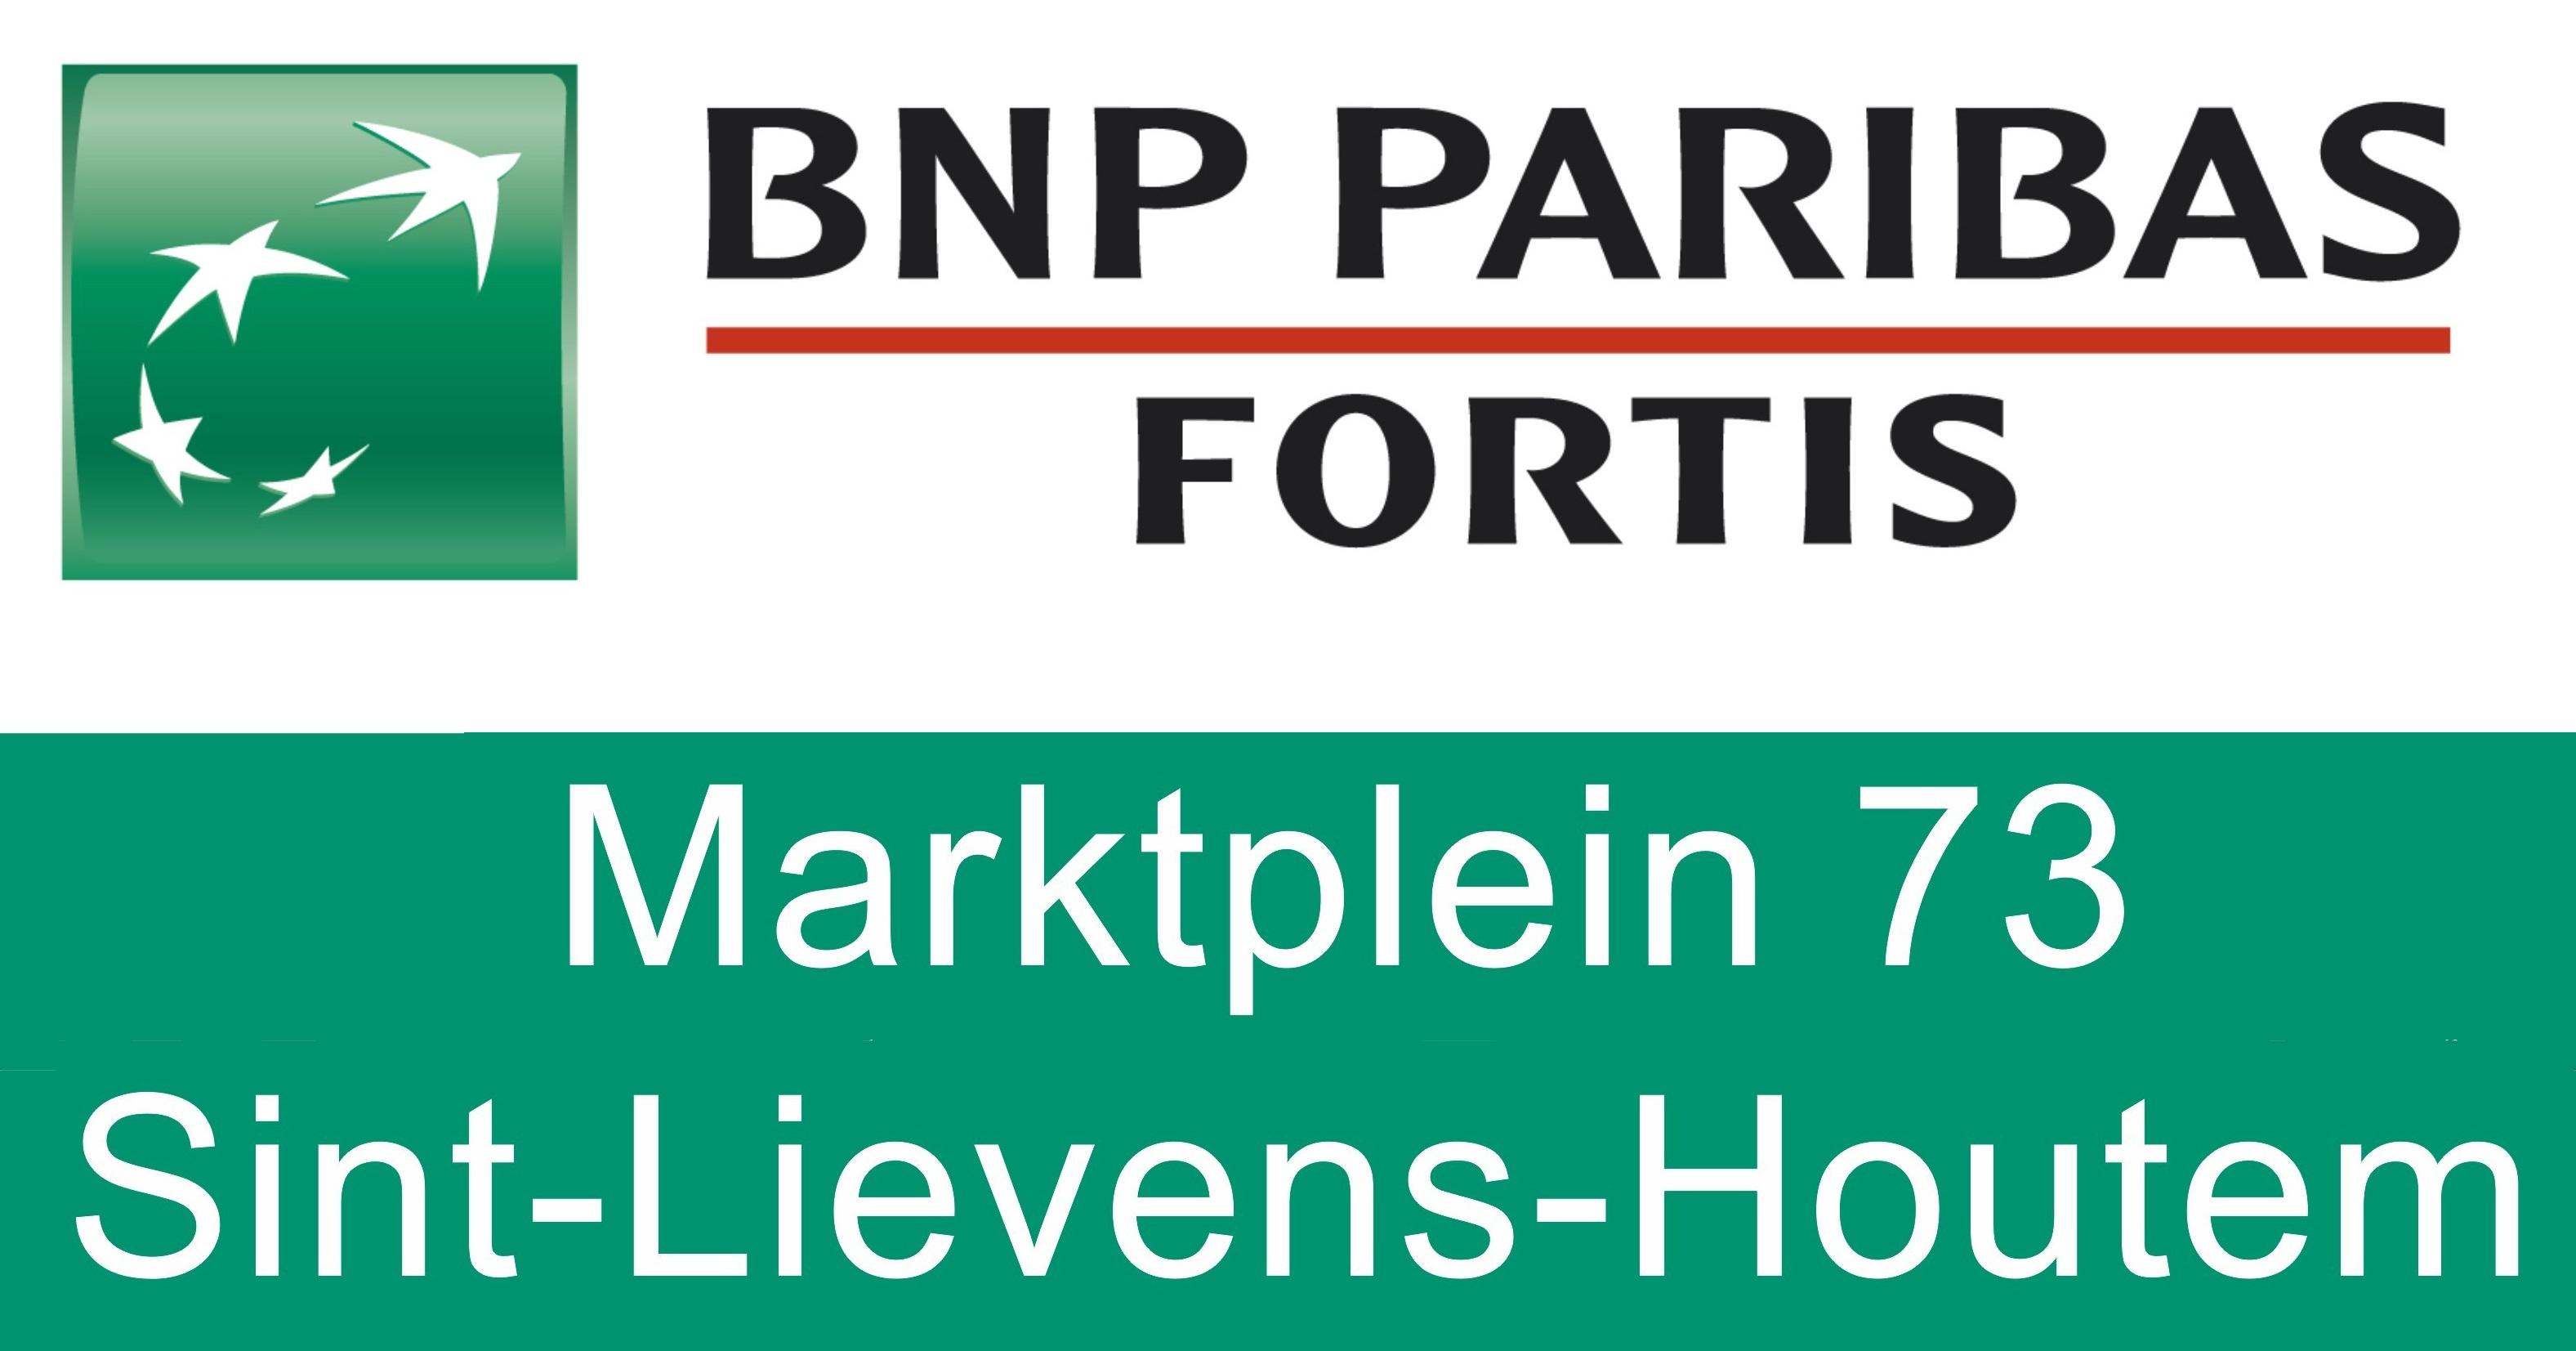 BNP Paribas-Fortis